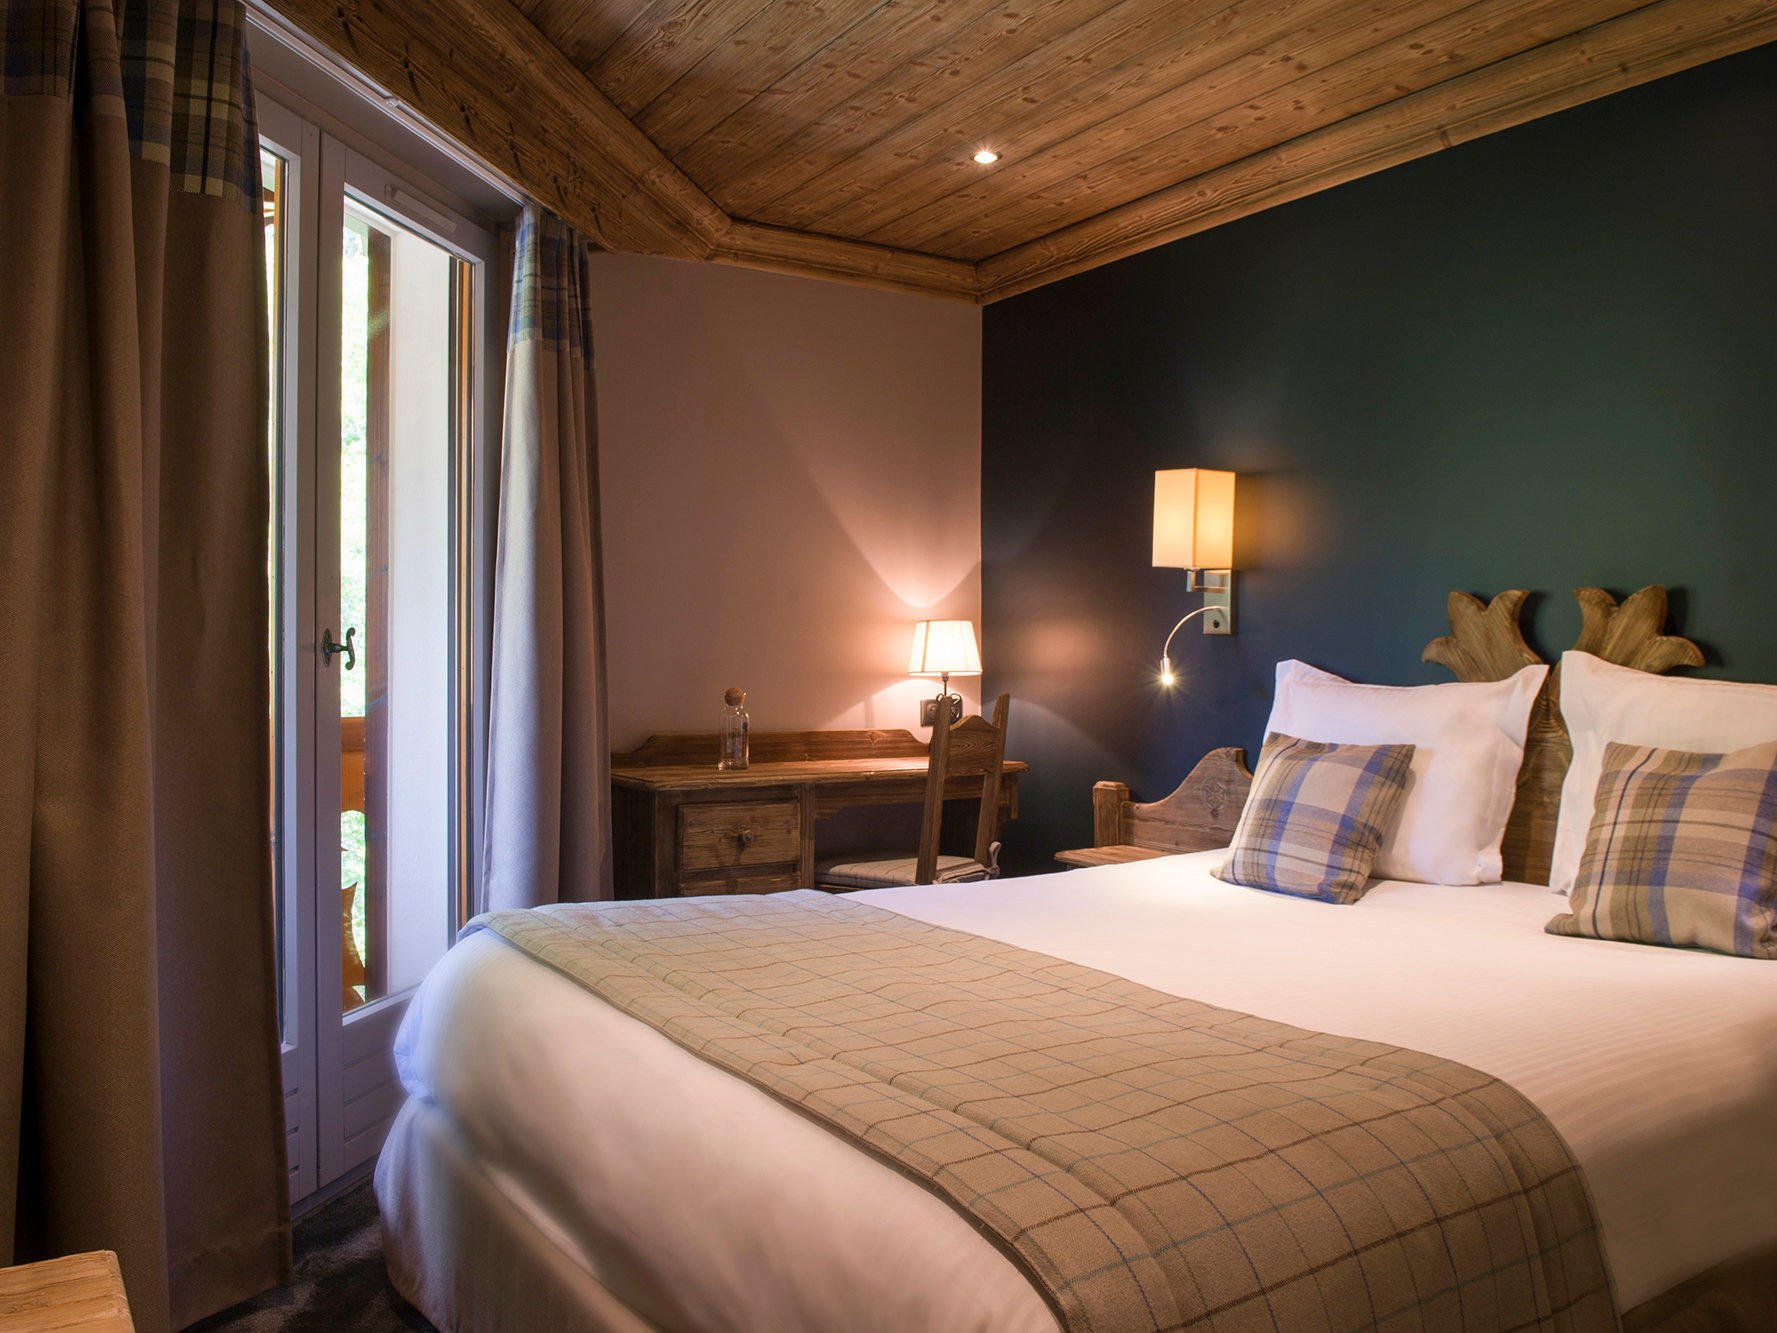 chambre standard 2 personnes hotel gentianettes, the originals